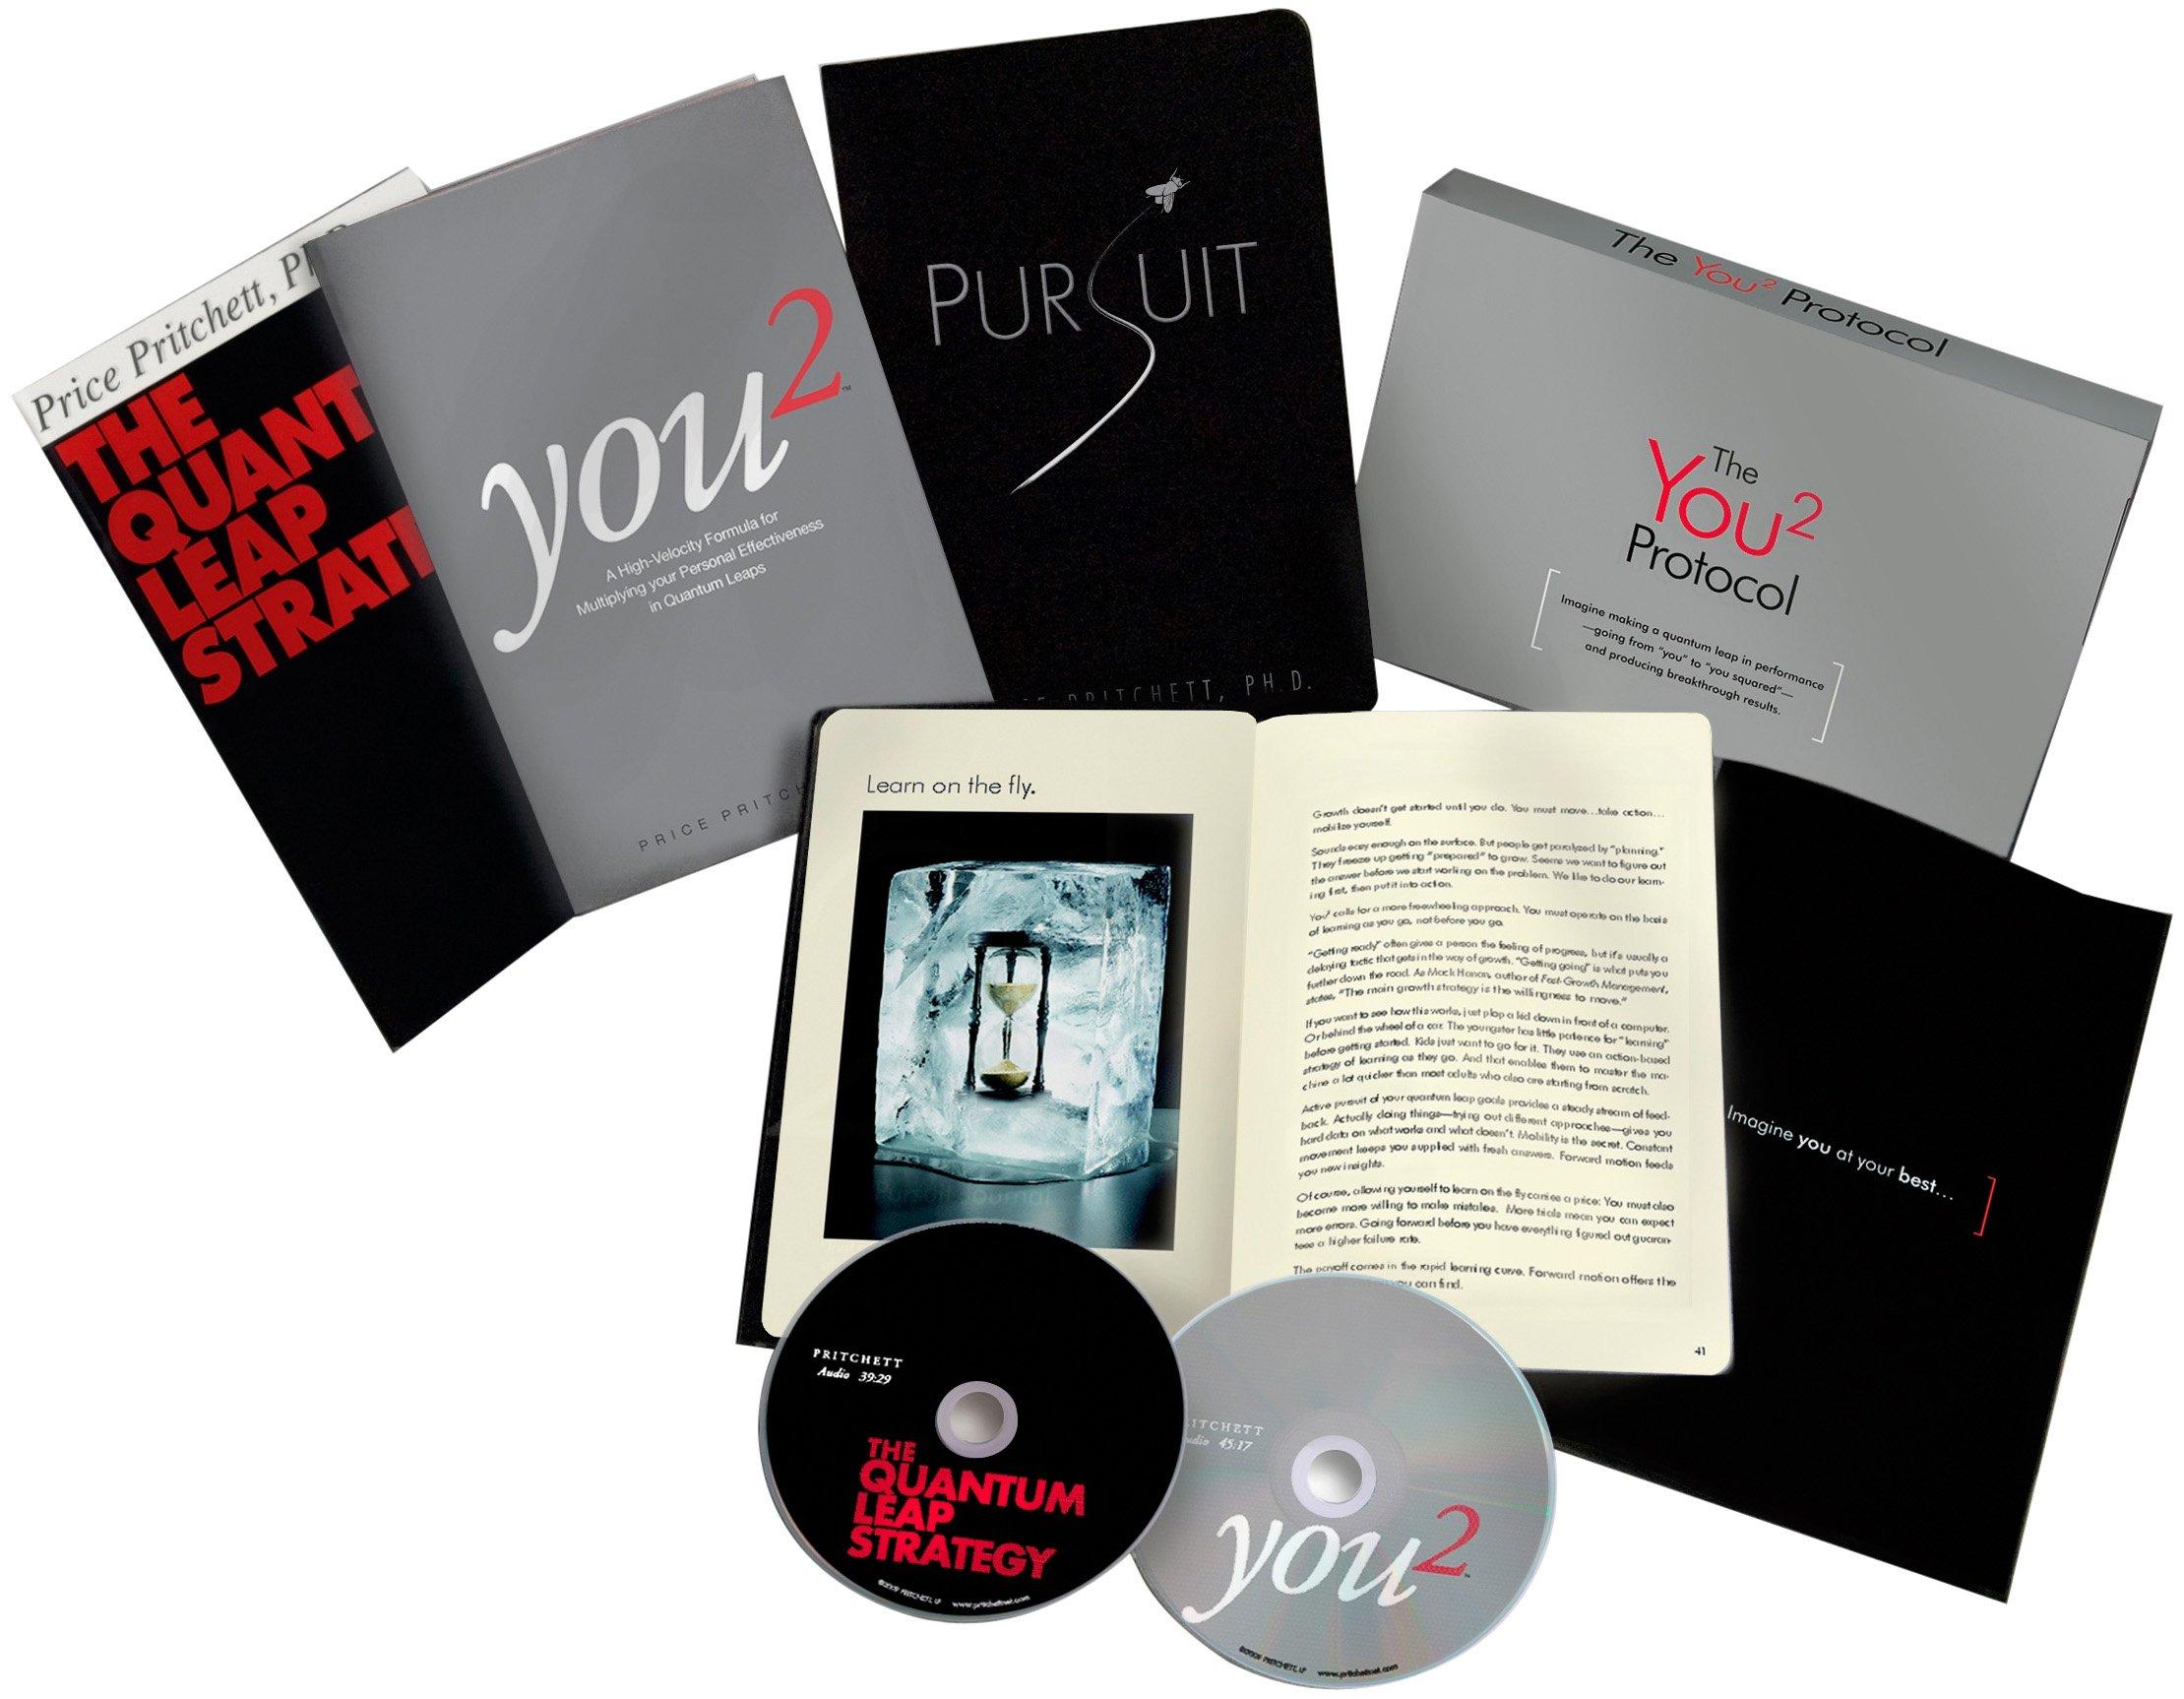 The you2 protocol price pritchett 9780944002971 amazon books fandeluxe Gallery